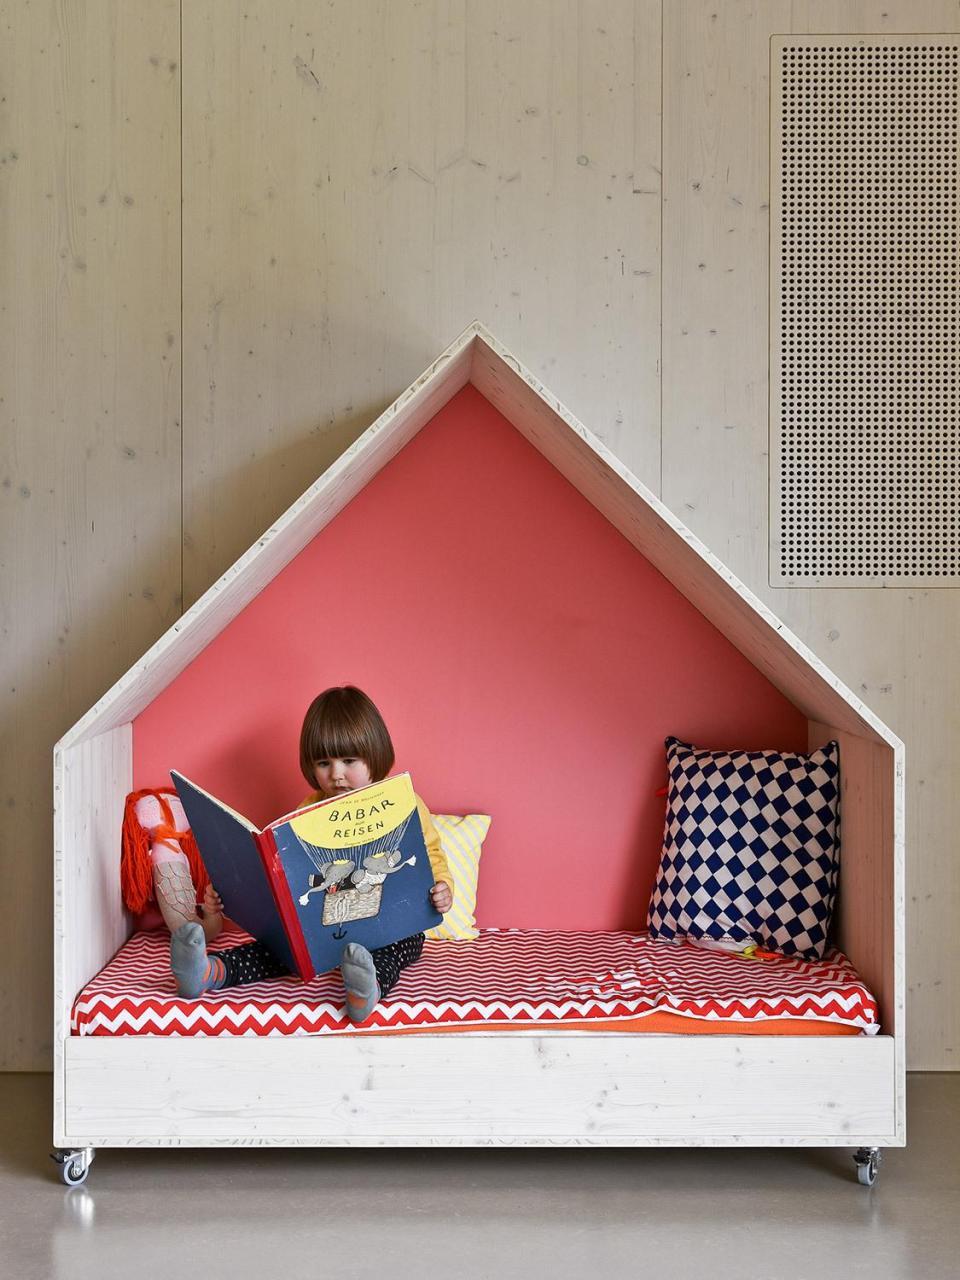 Ideas para crear un rincon de lectura Montessori infantil 14